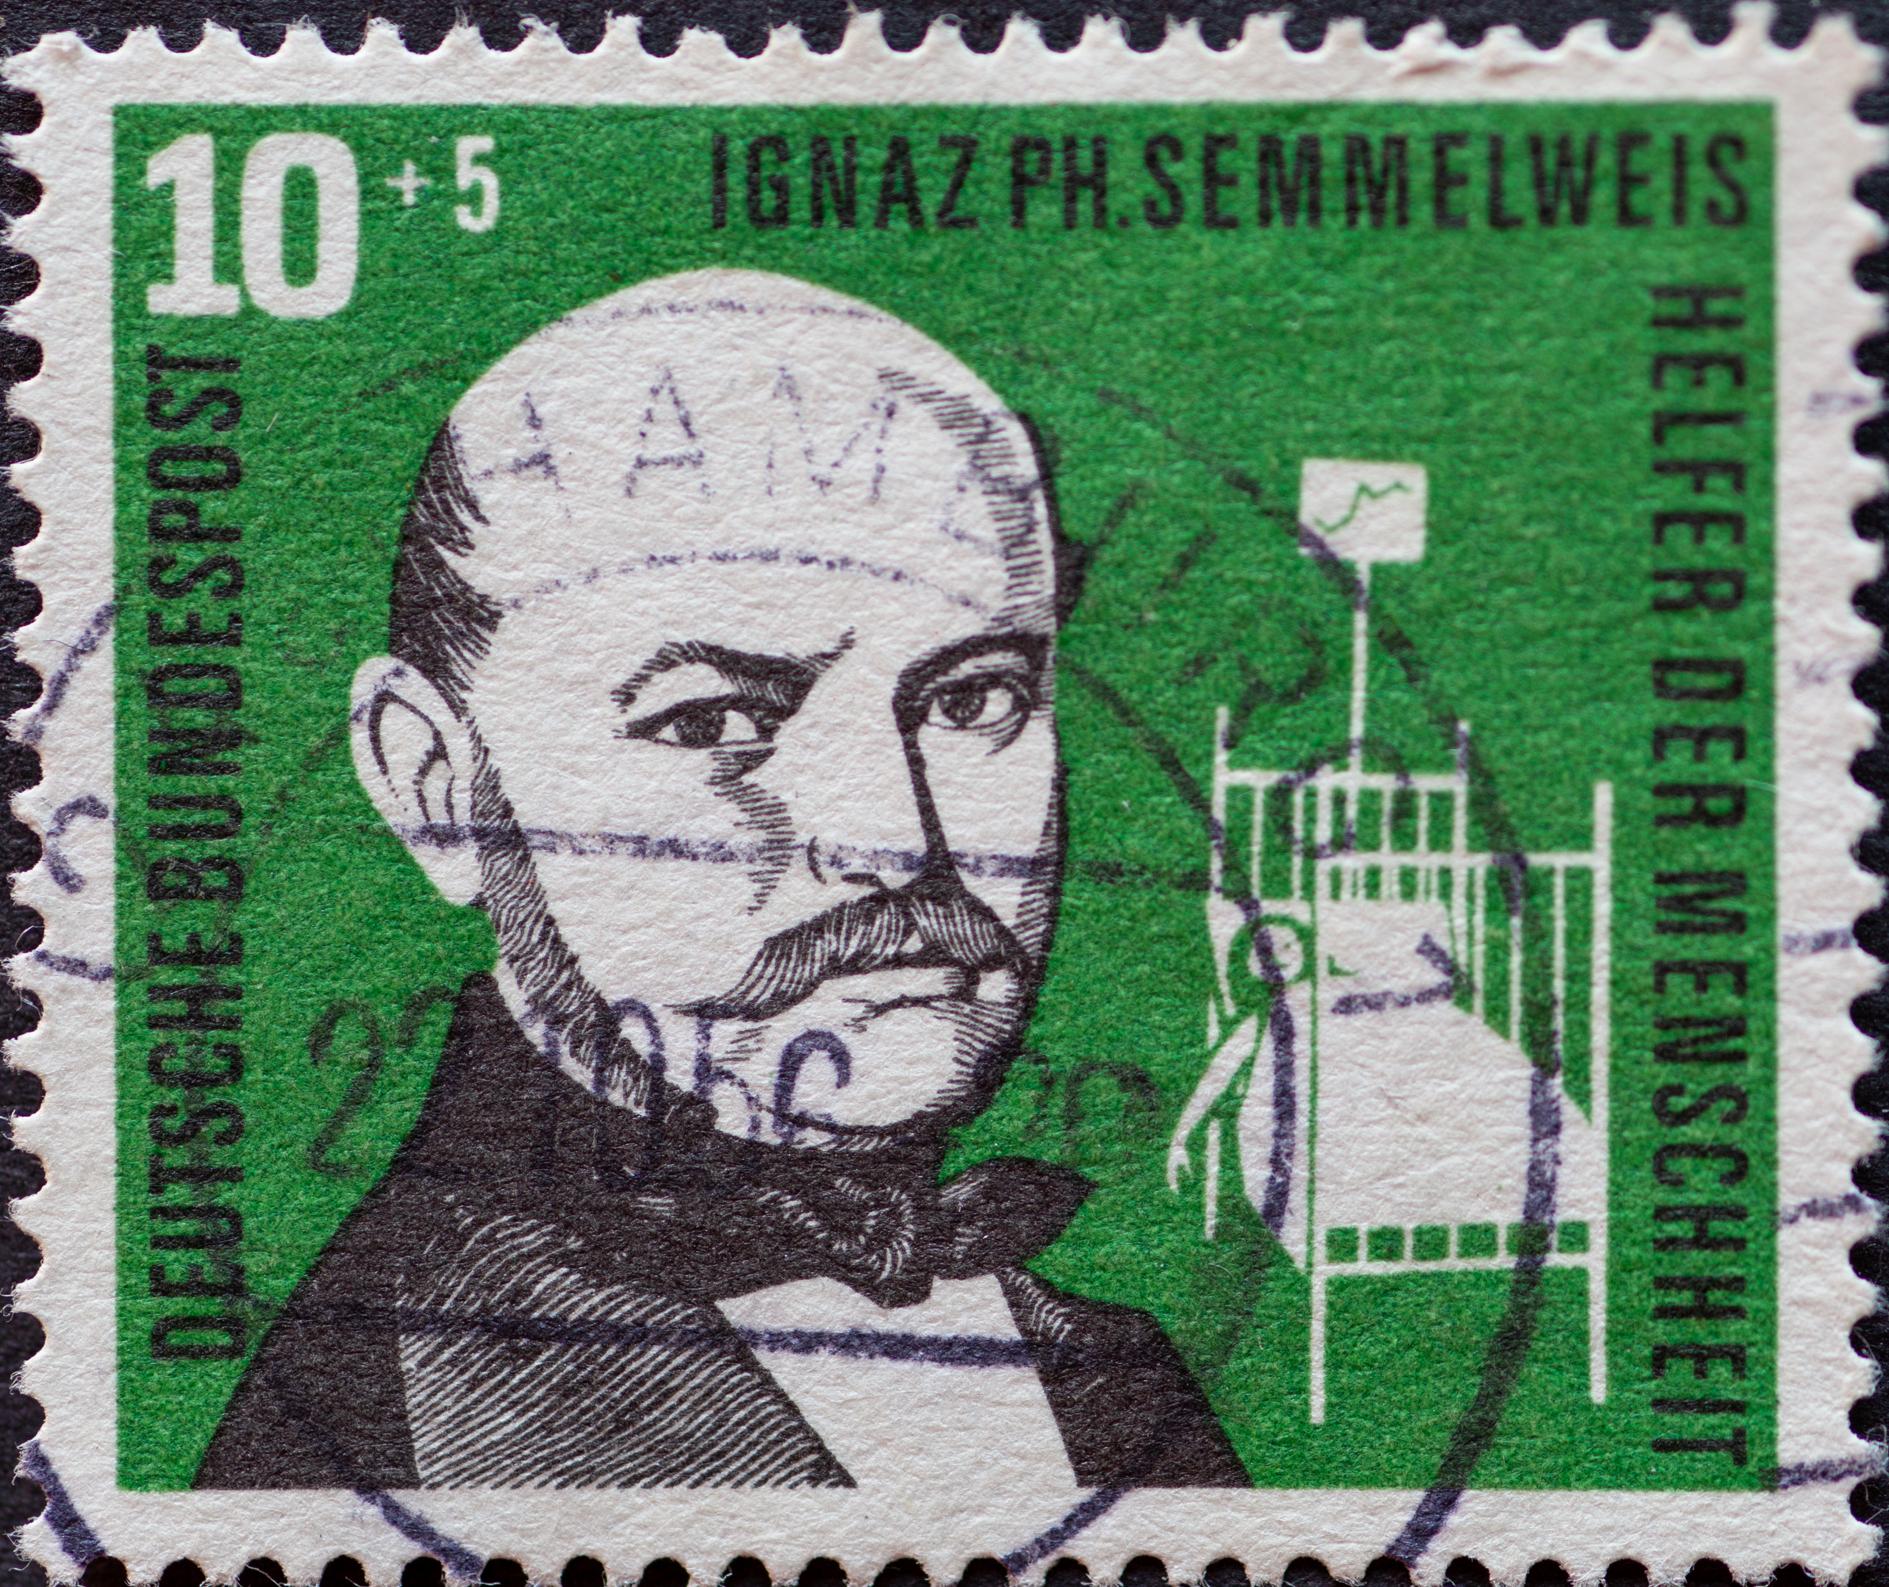 Dr Semmelweis